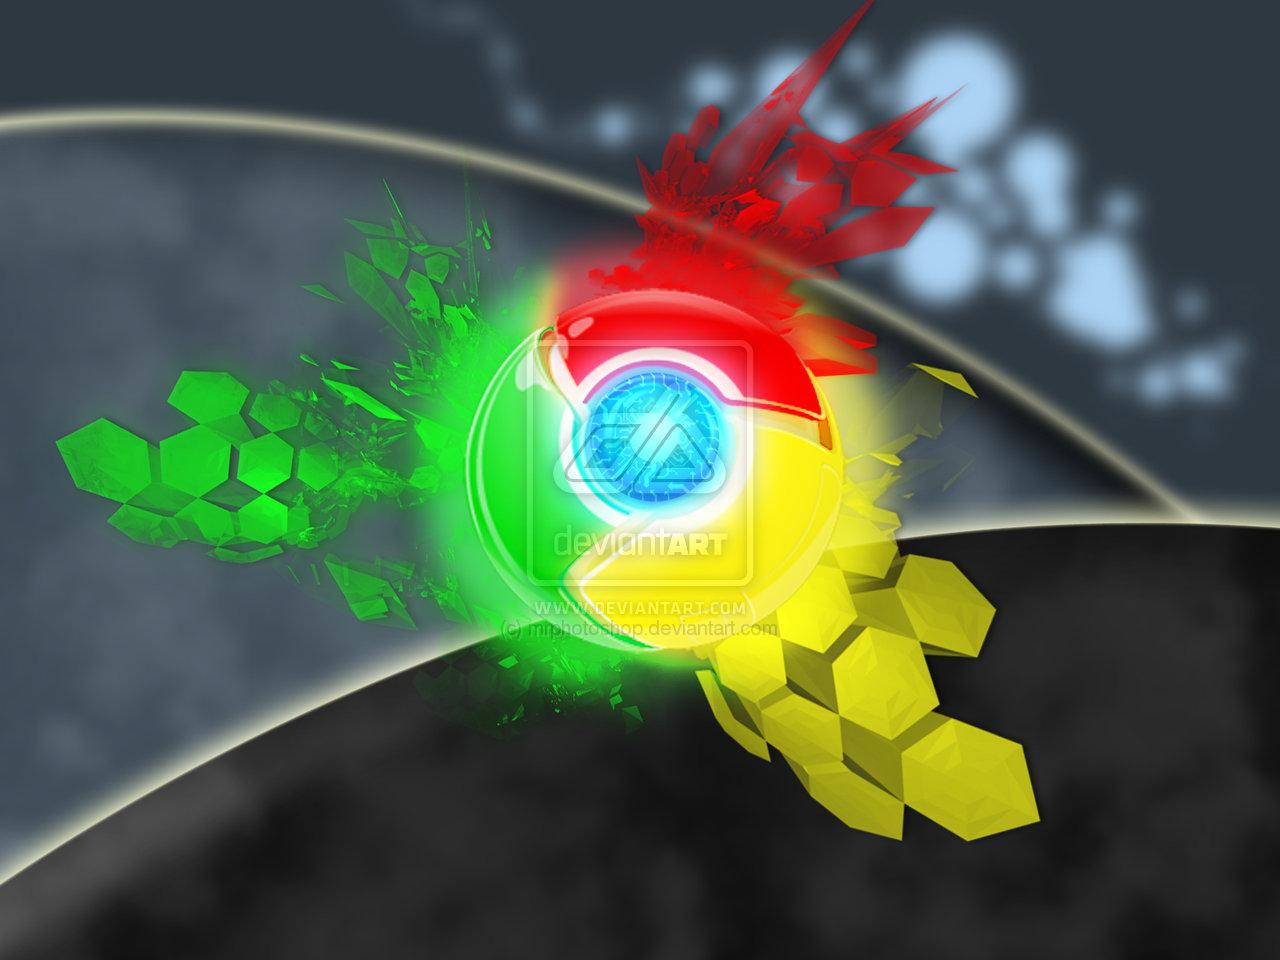 Google chrome themes zombie - Cool Google Chrome Wallpapers